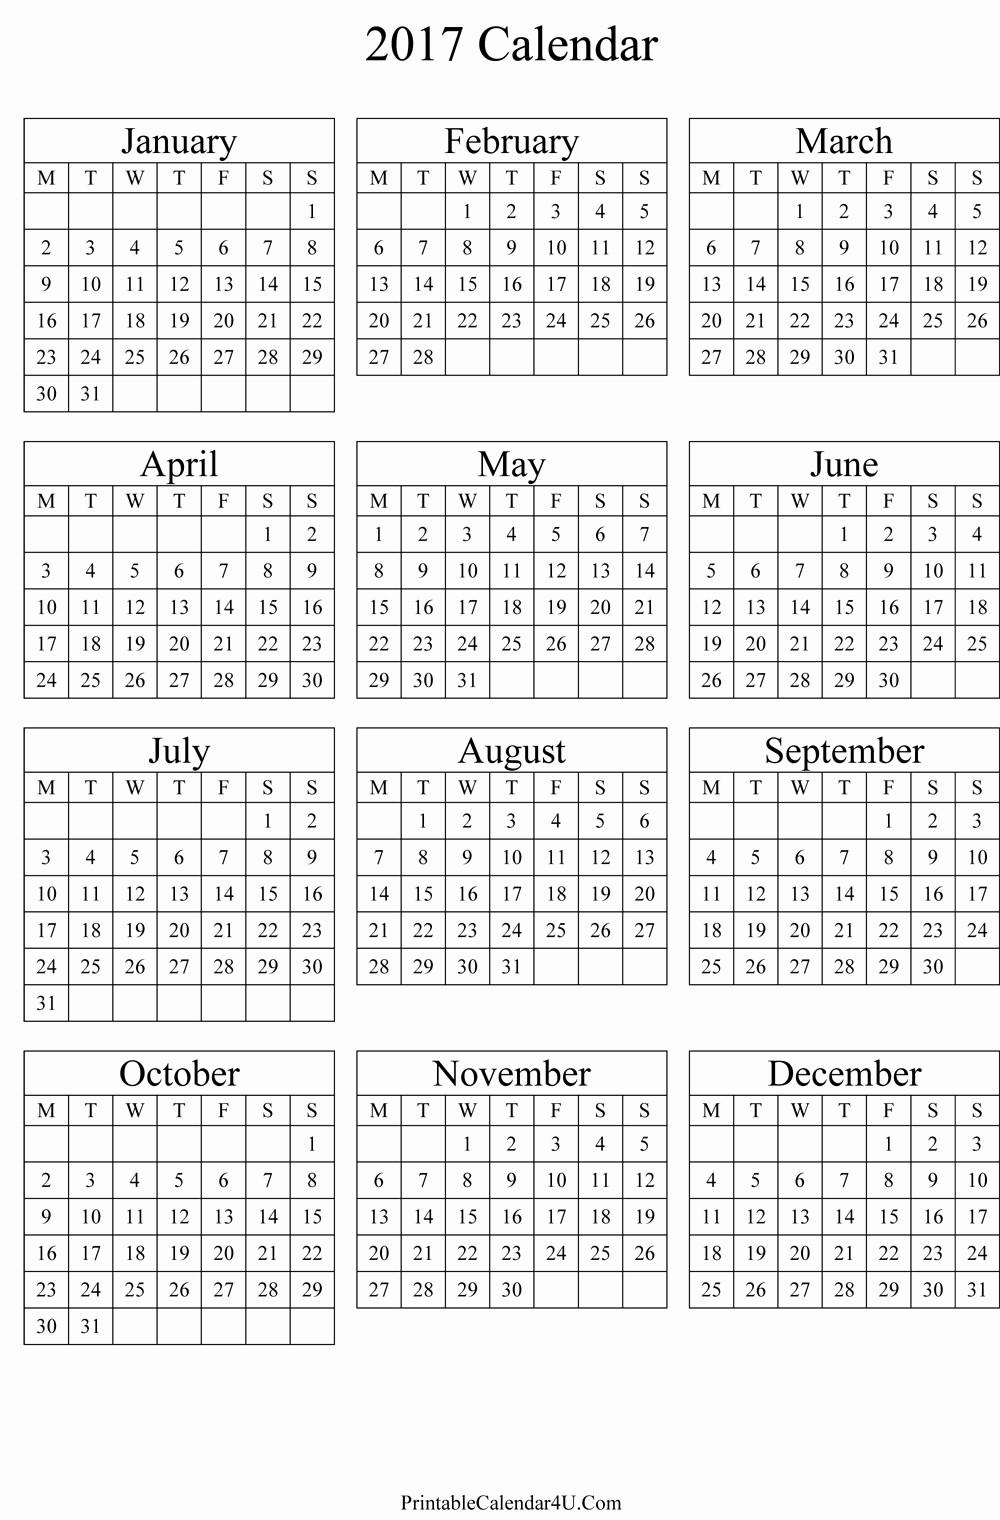 Free 2017 Yearly Calendar Template Best Of Annual Calendar 2017 Portrait Printable Calendar 2019 2020